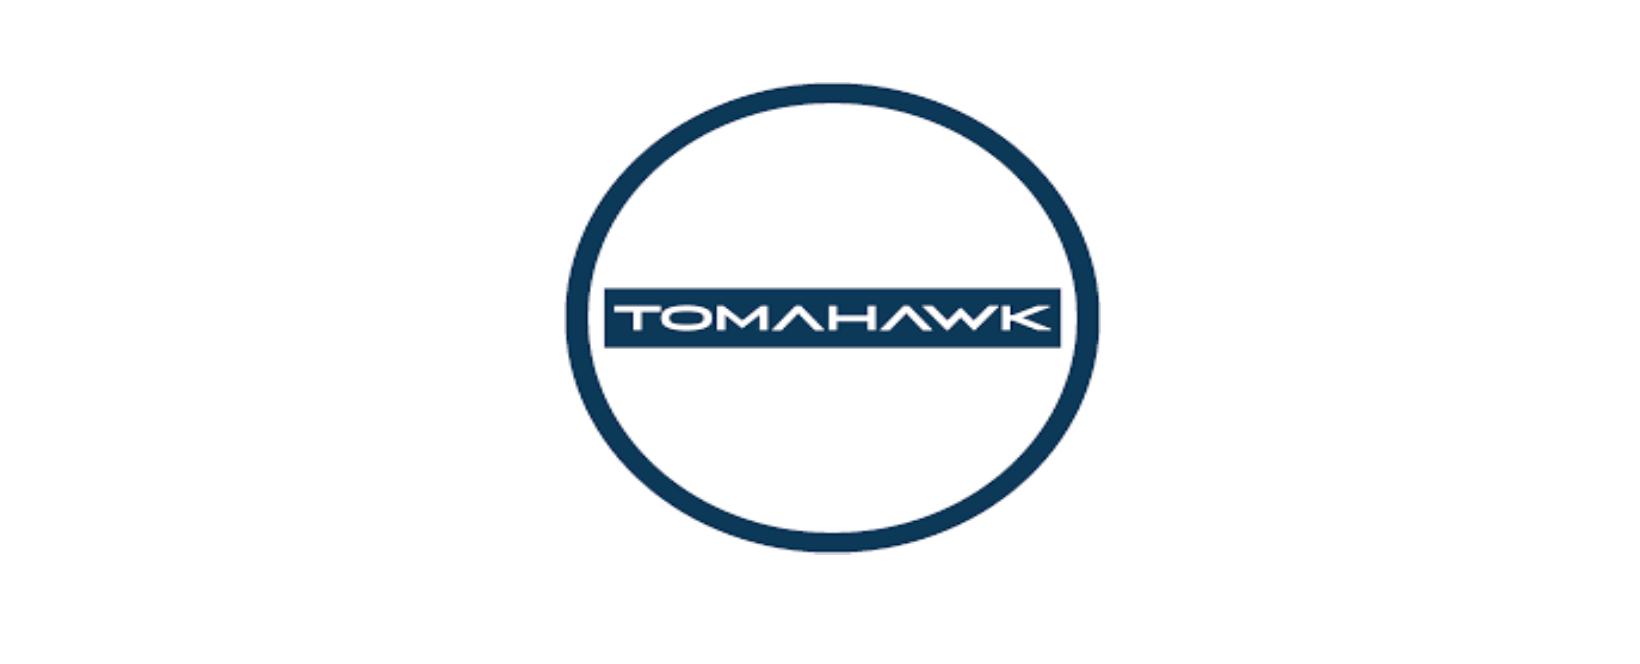 Tomahawk Shades US Discount Code 2021